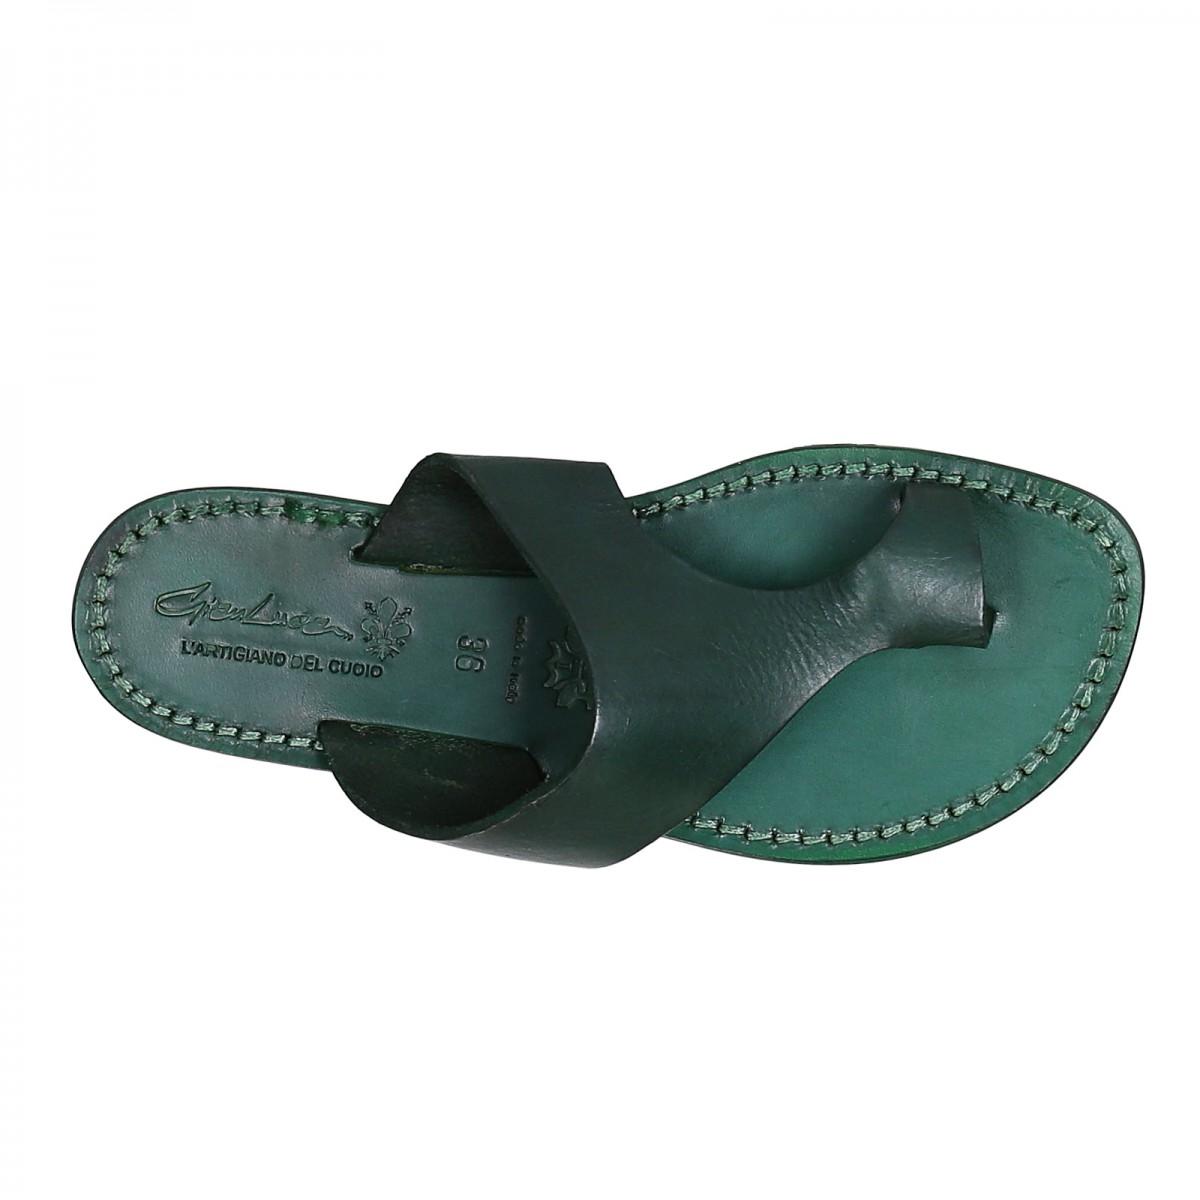 c6de069e6ceb ... Green leather thong sandals for women handmade ...